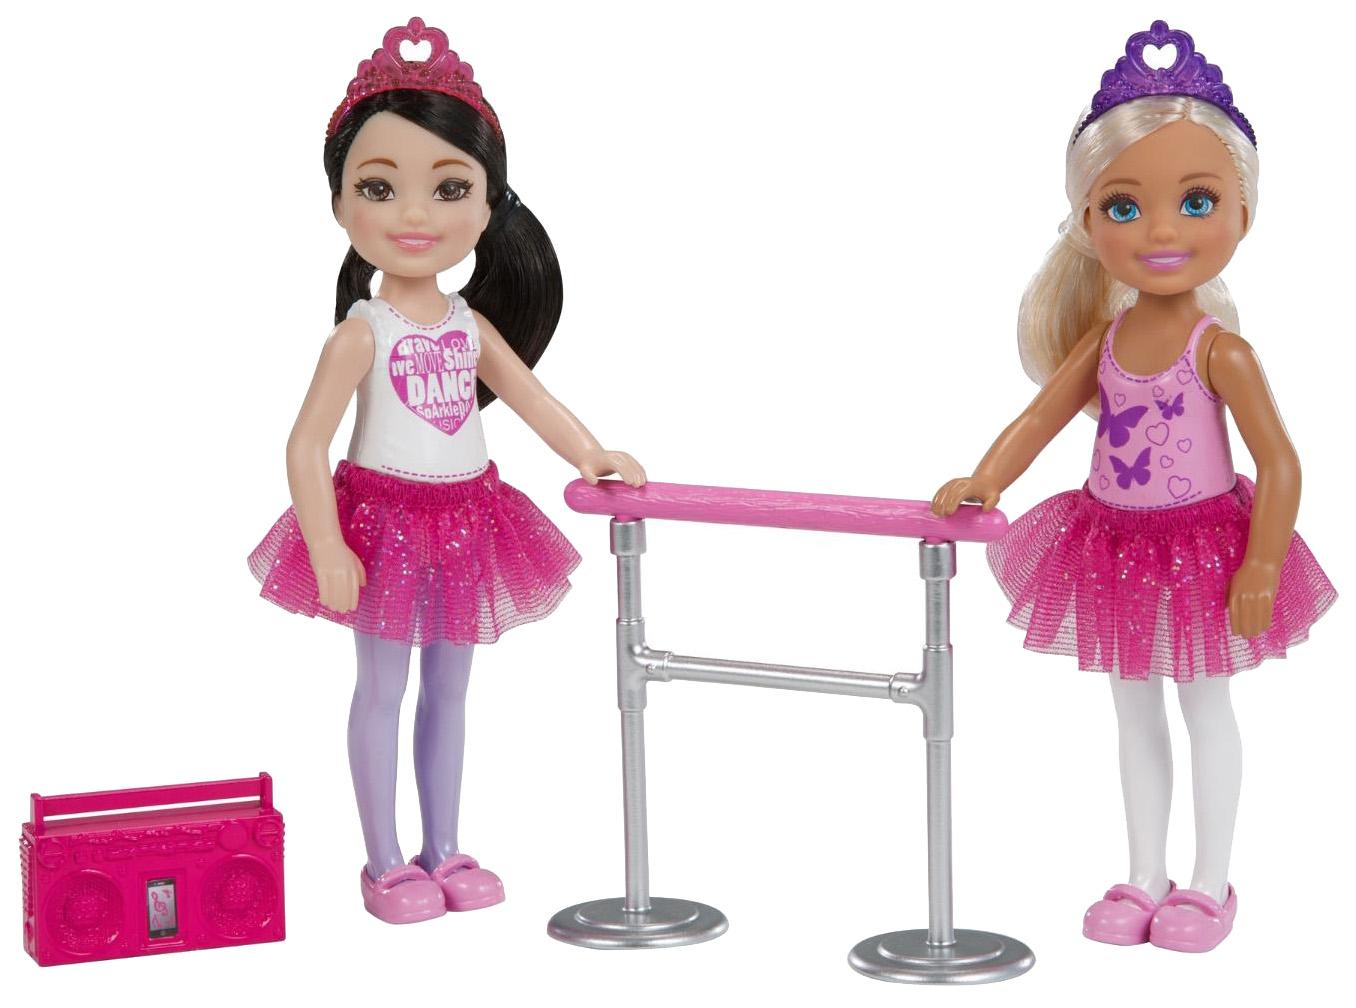 Купить Челси Балерины 2 шт., Куклы Barbie Челси Балерины FHK96/FHK98 2 шт